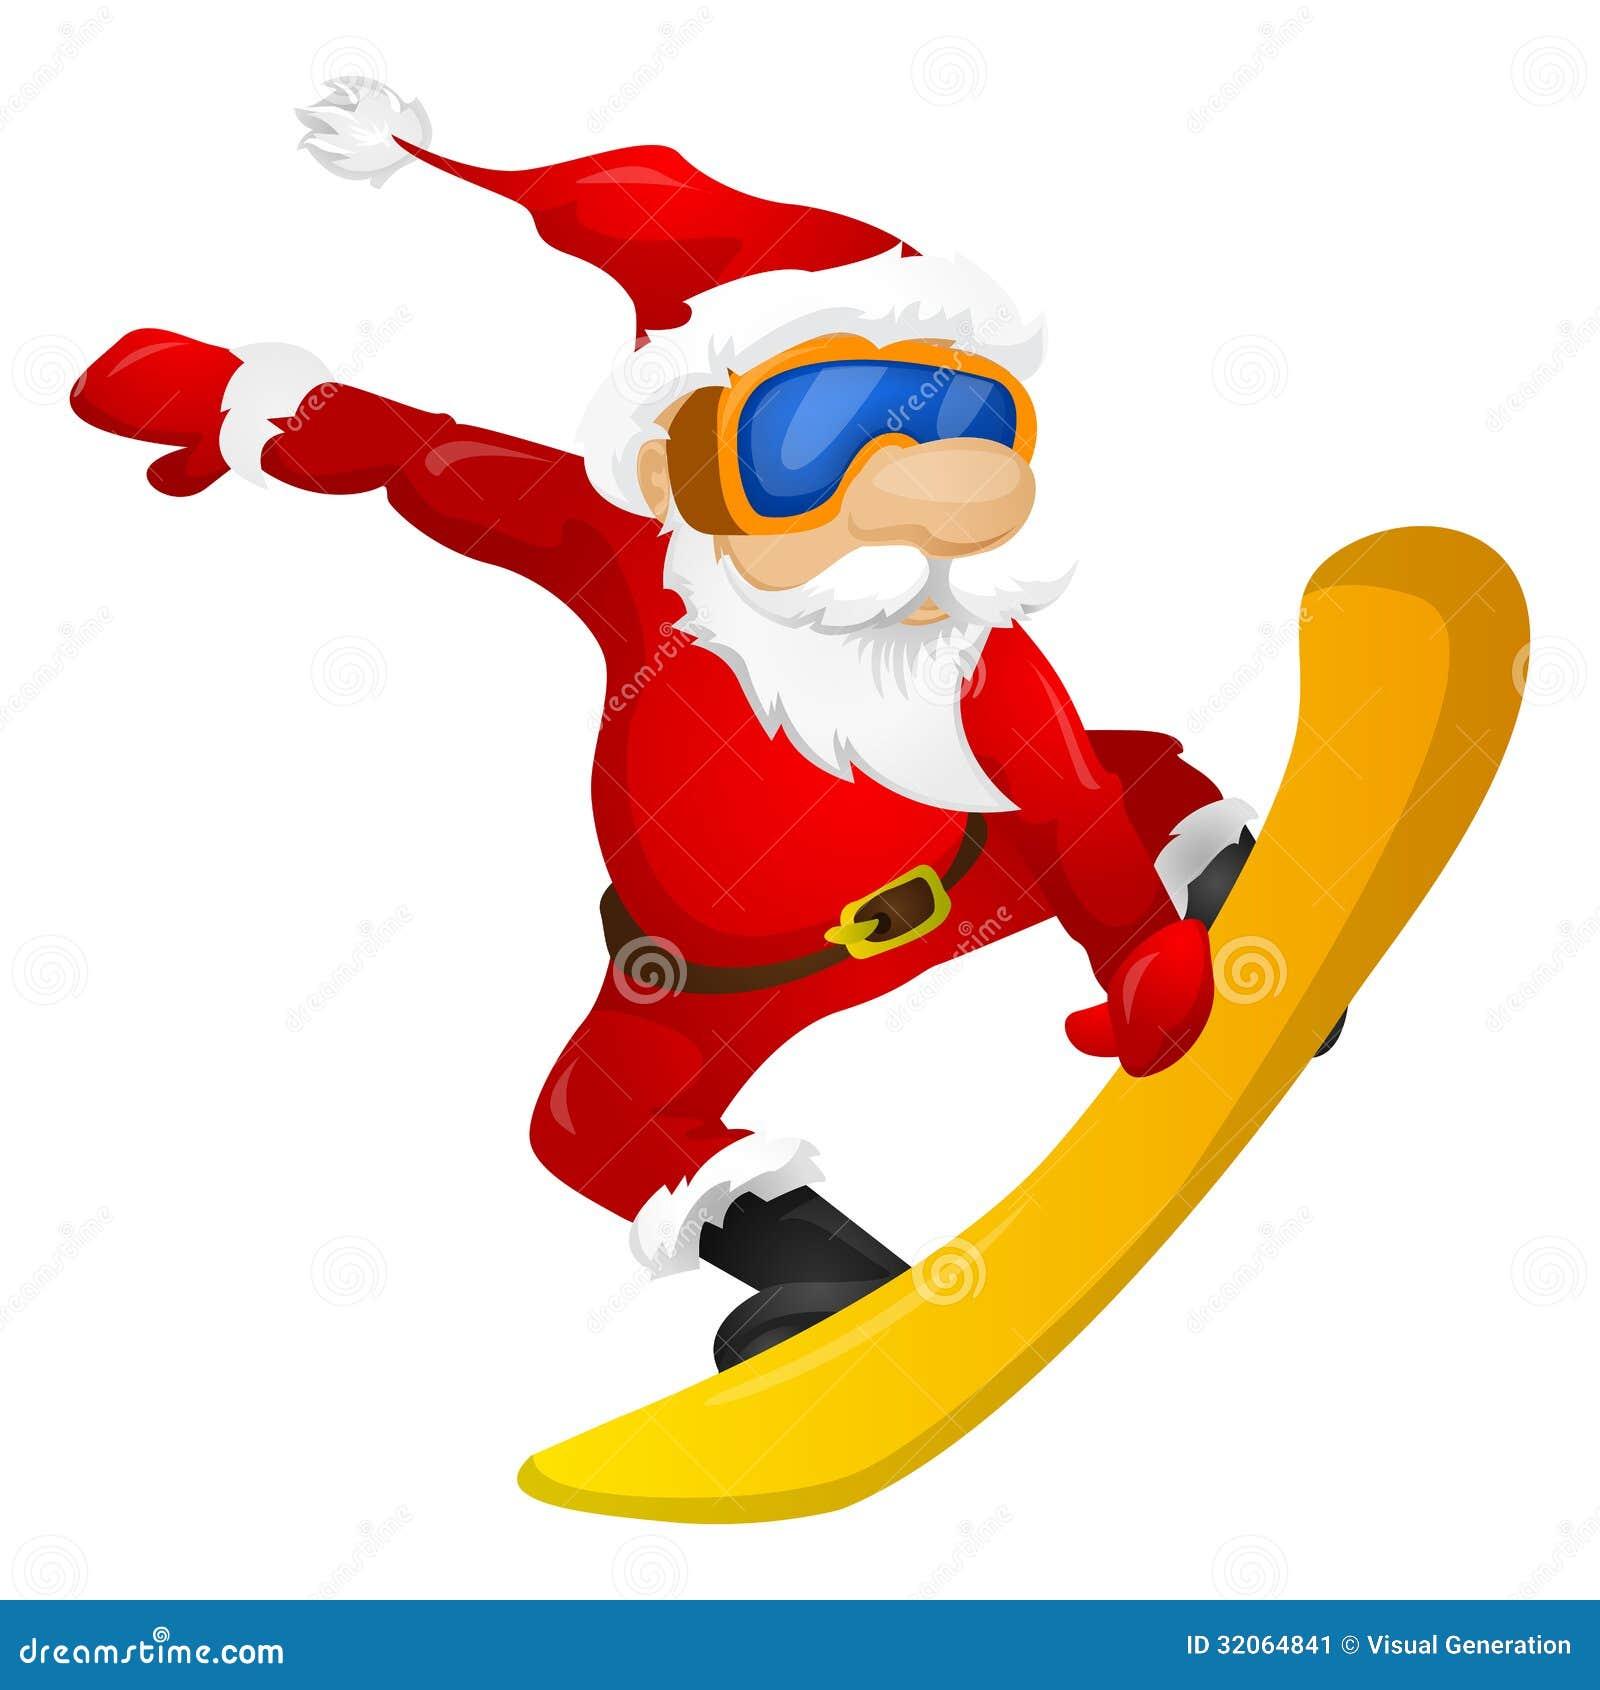 Santa Snowboarding snowboarding santa claus royalty free stock ...